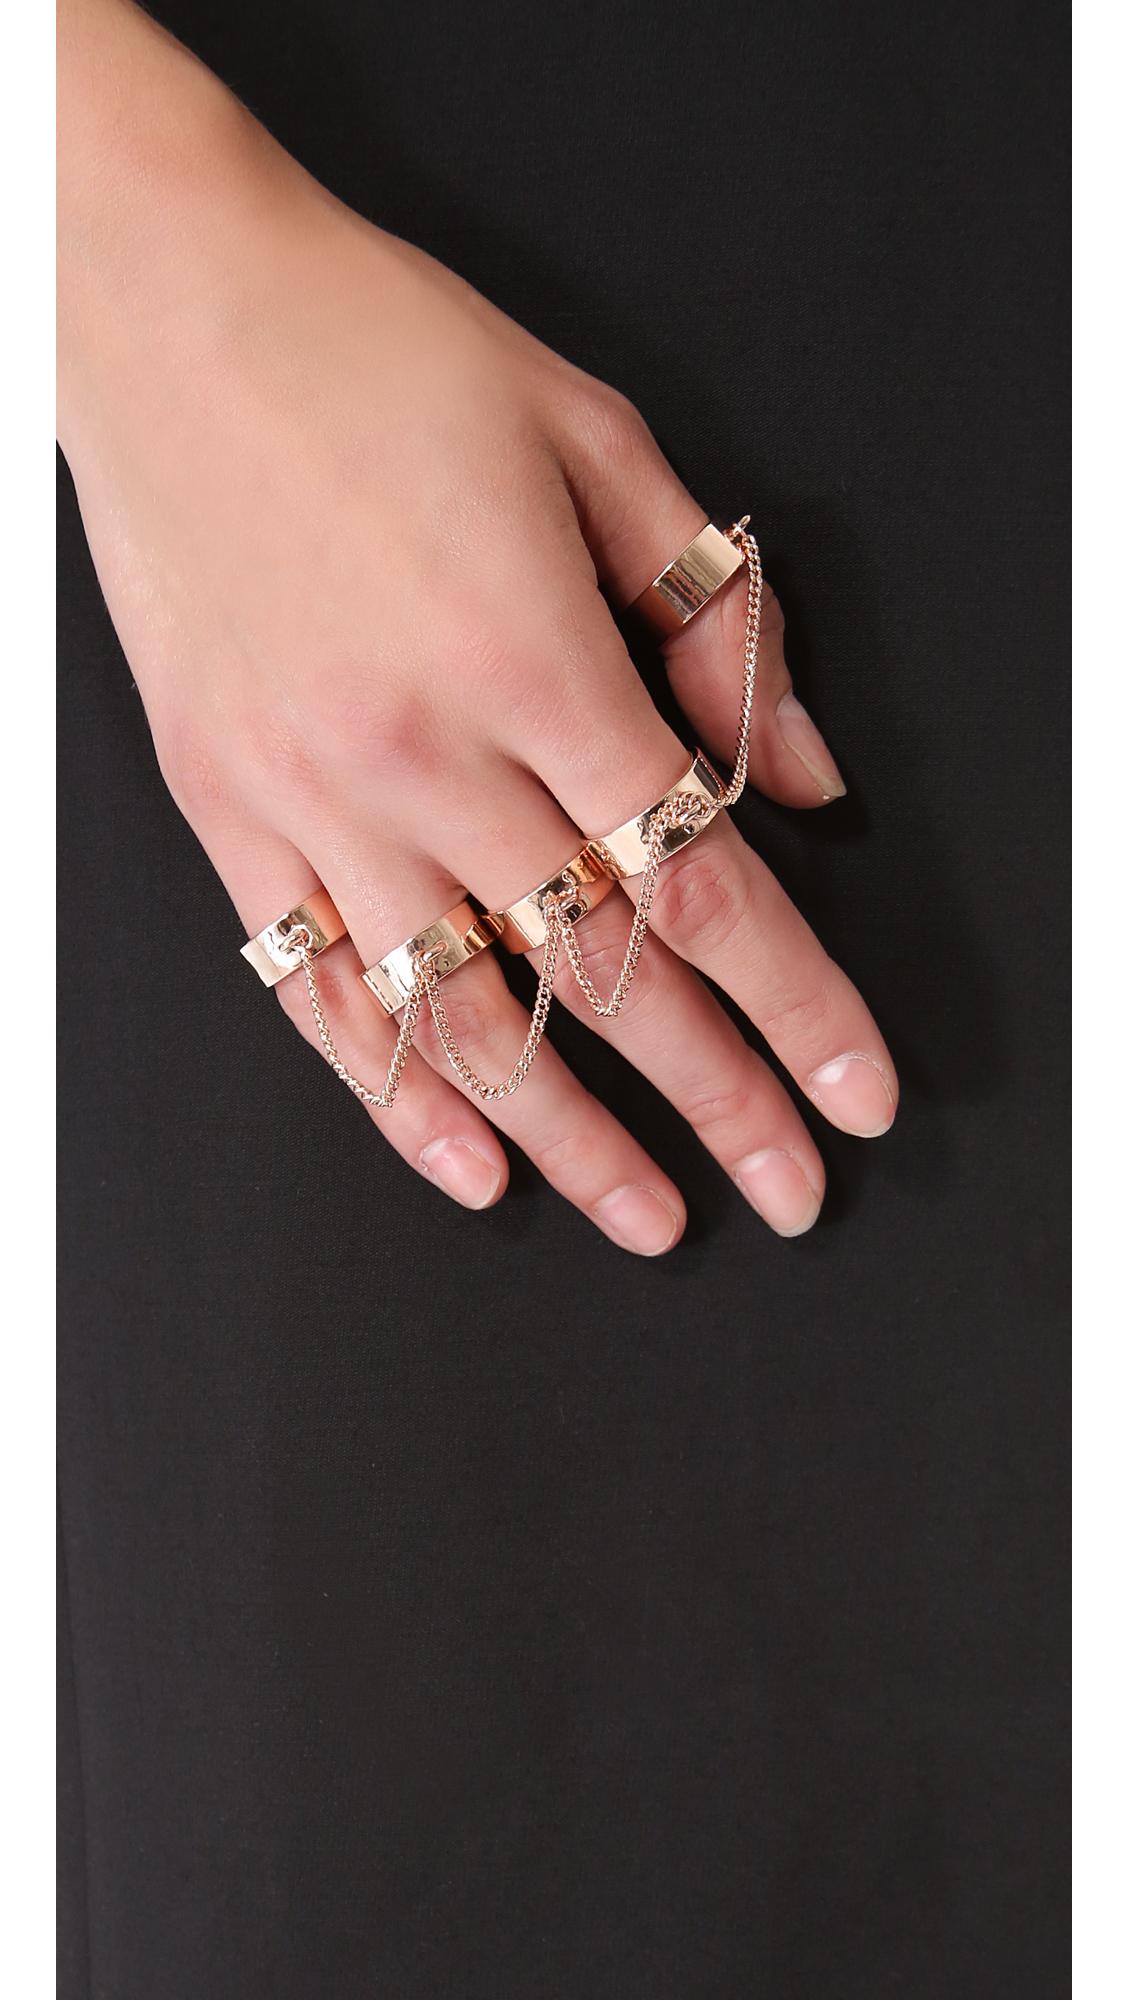 d6204de679f1 Eddie Borgo Five Finger Ring